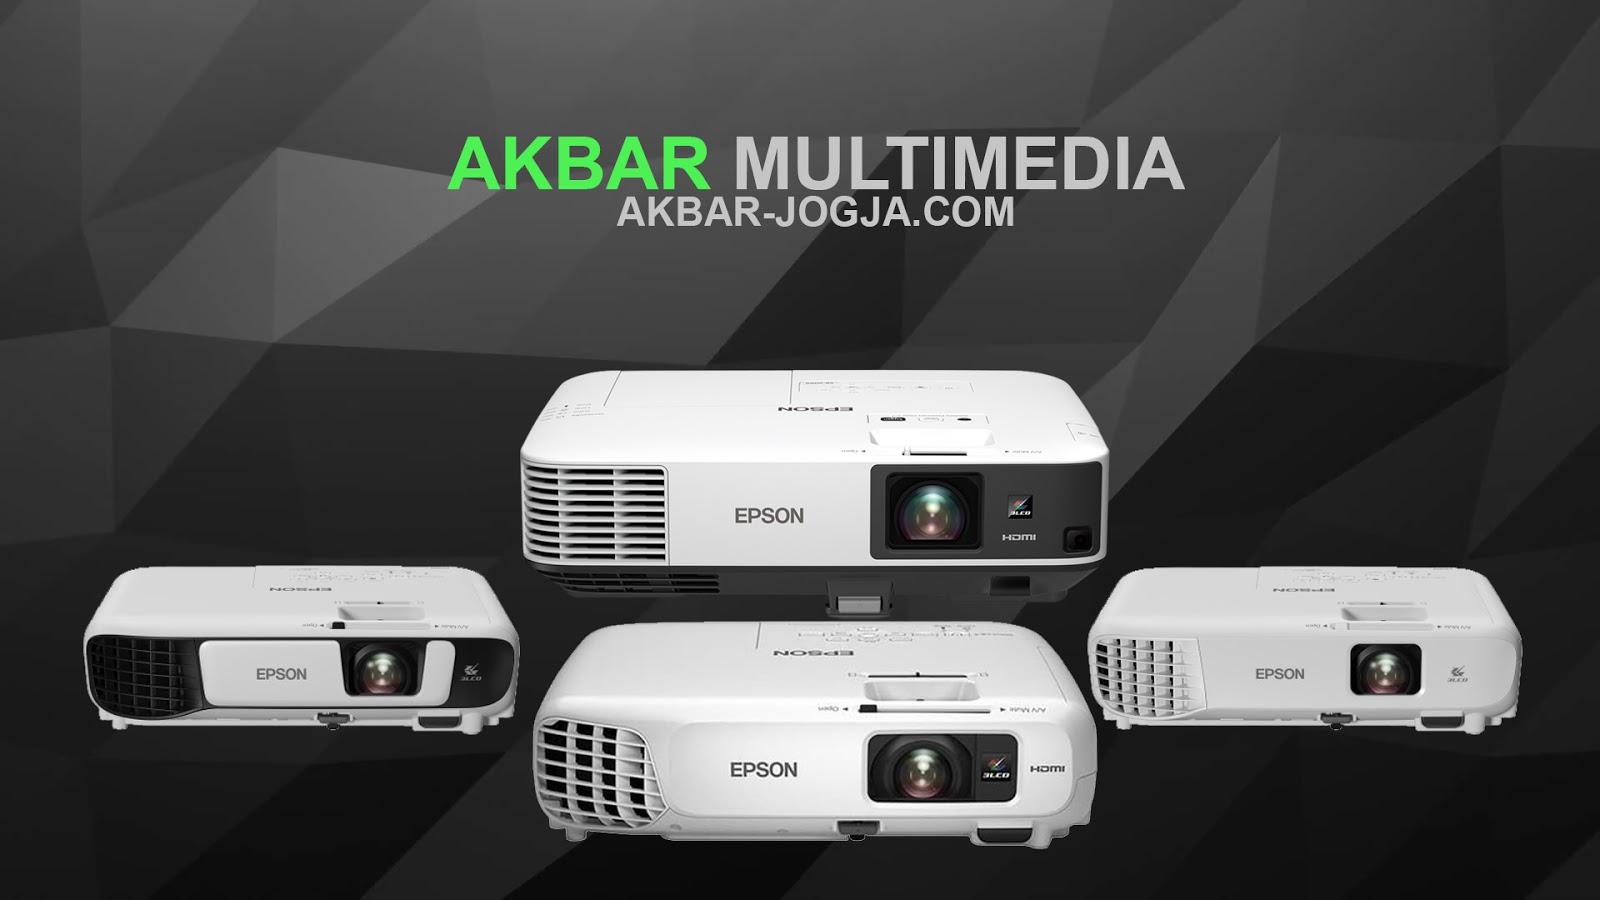 Akbar Multimedia Tempat Sewa proyektor di Jogja